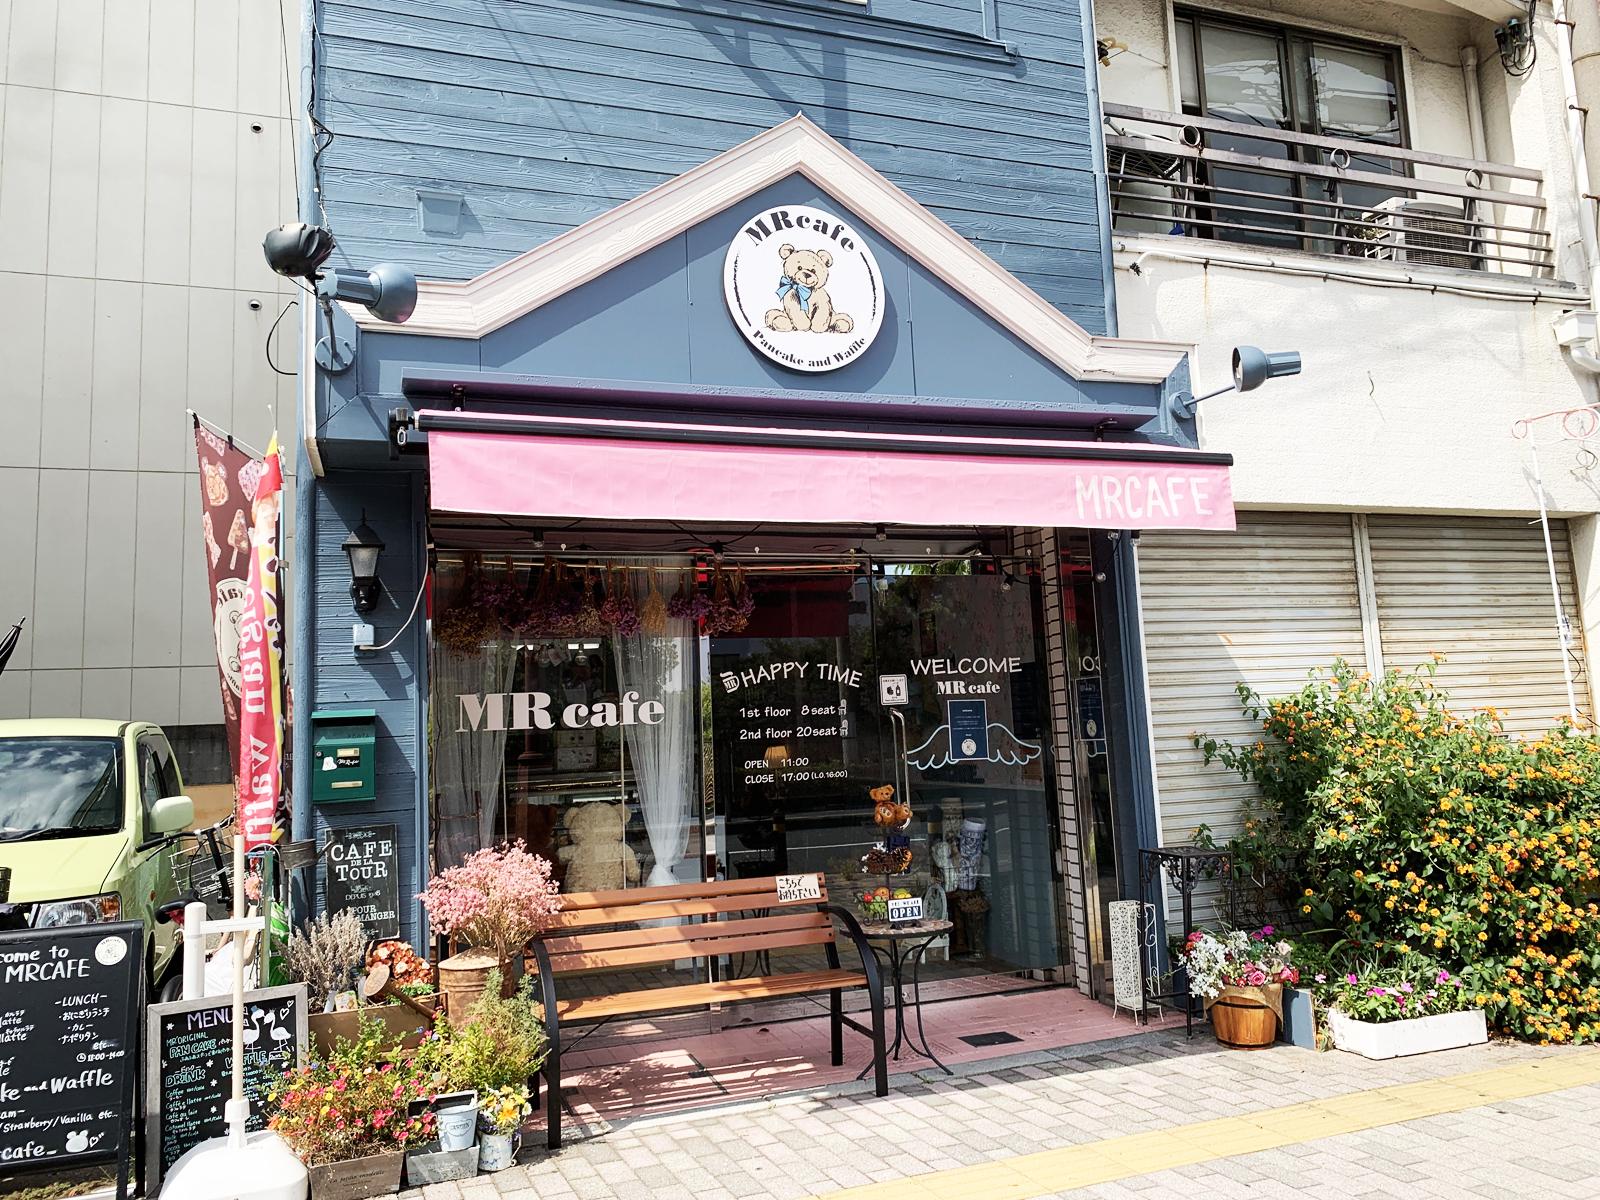 MRcafe